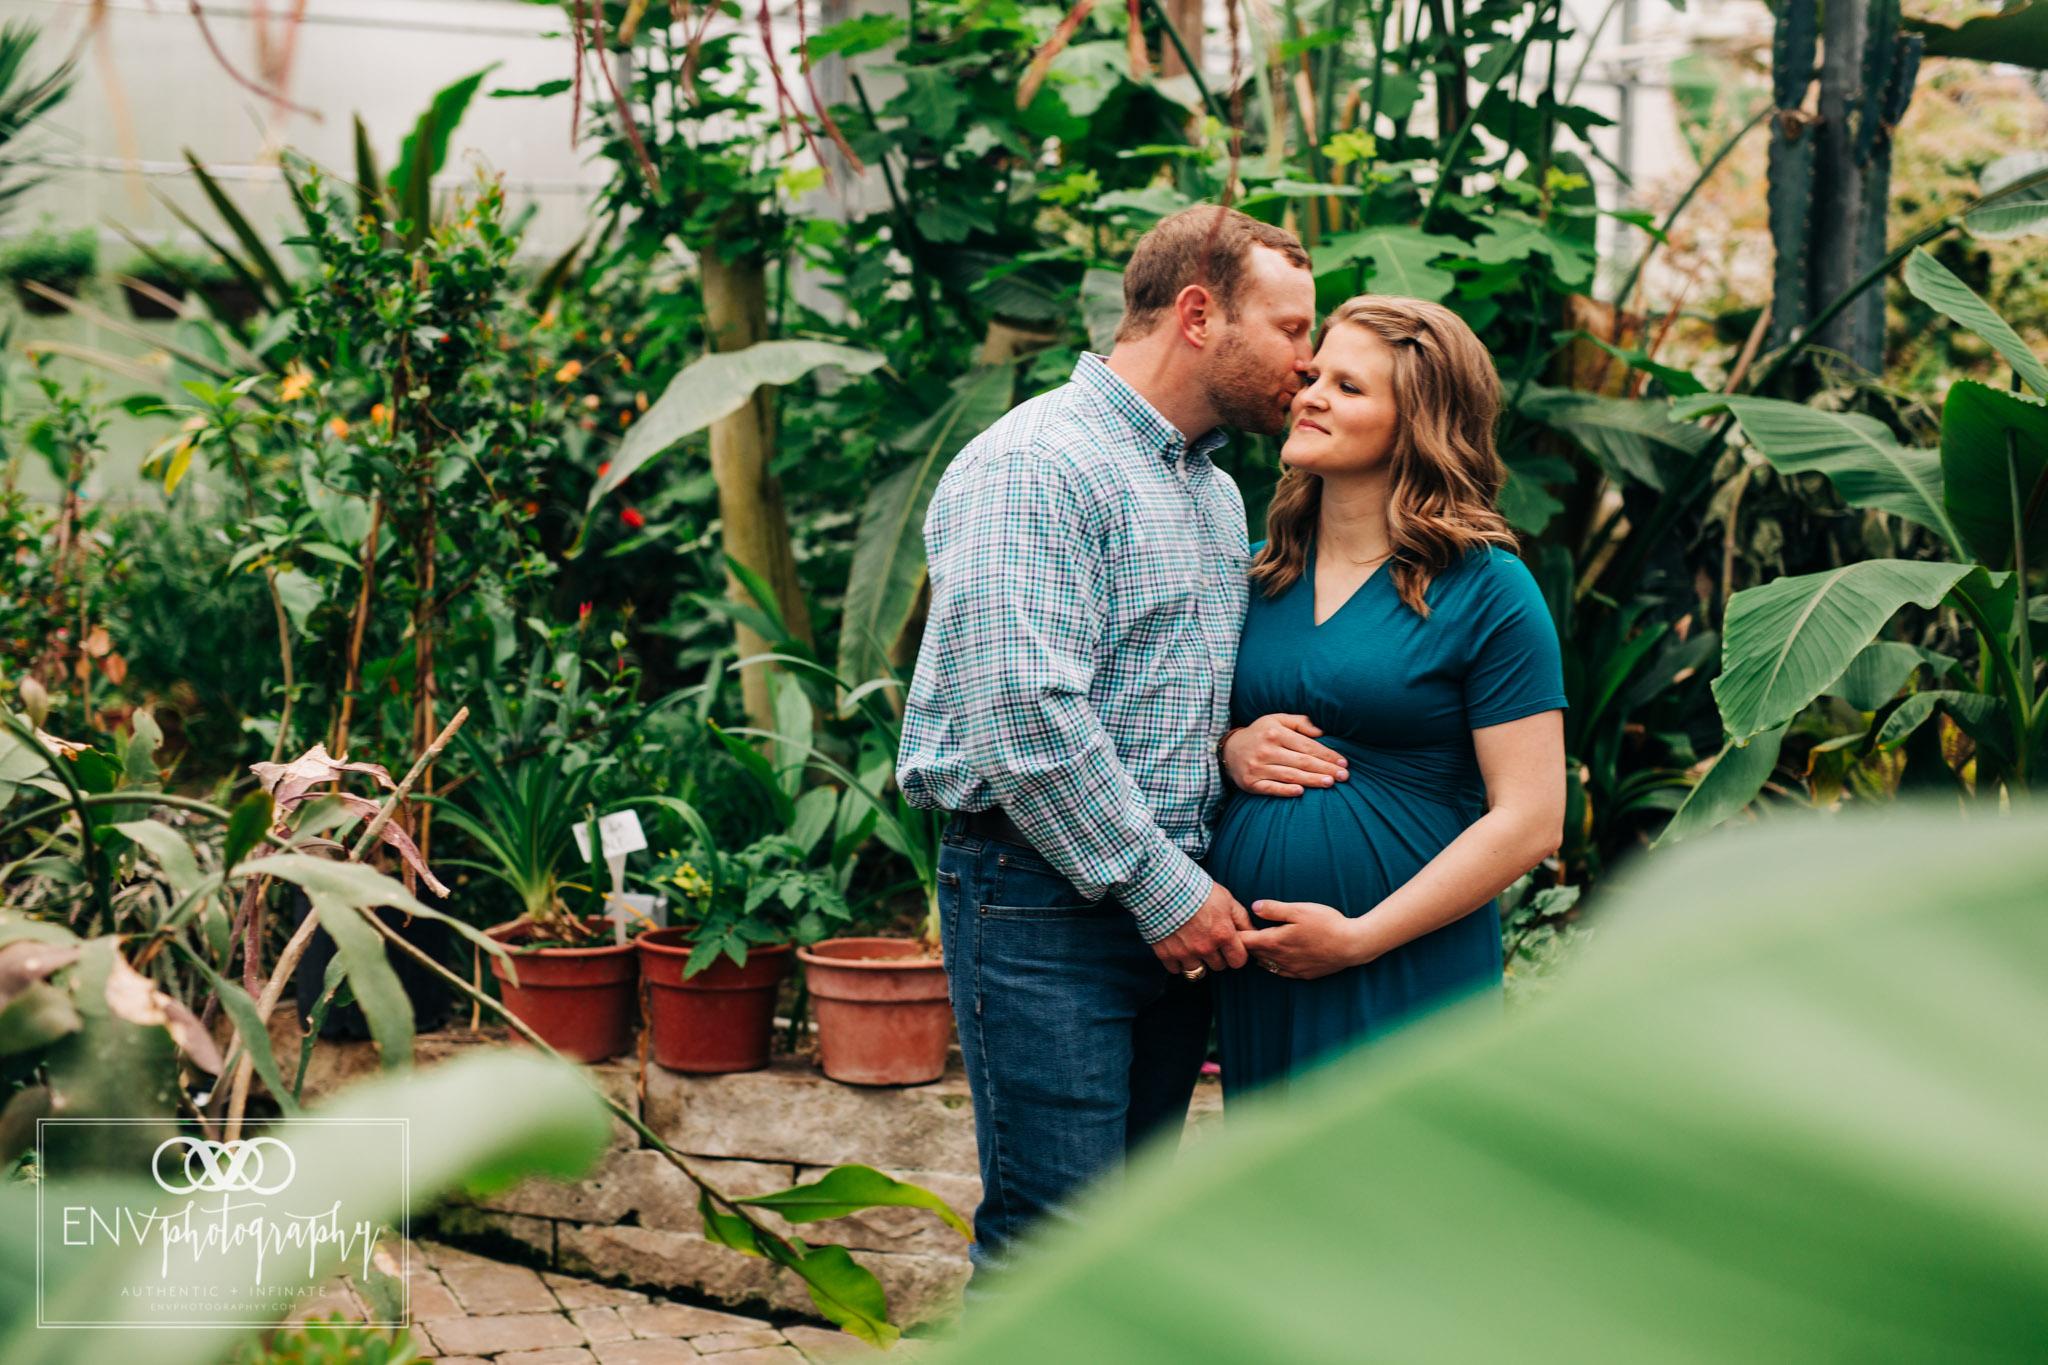 mount vernon columbus mansfield ohio maternity newborn photographer mohican gardens (3).jpg